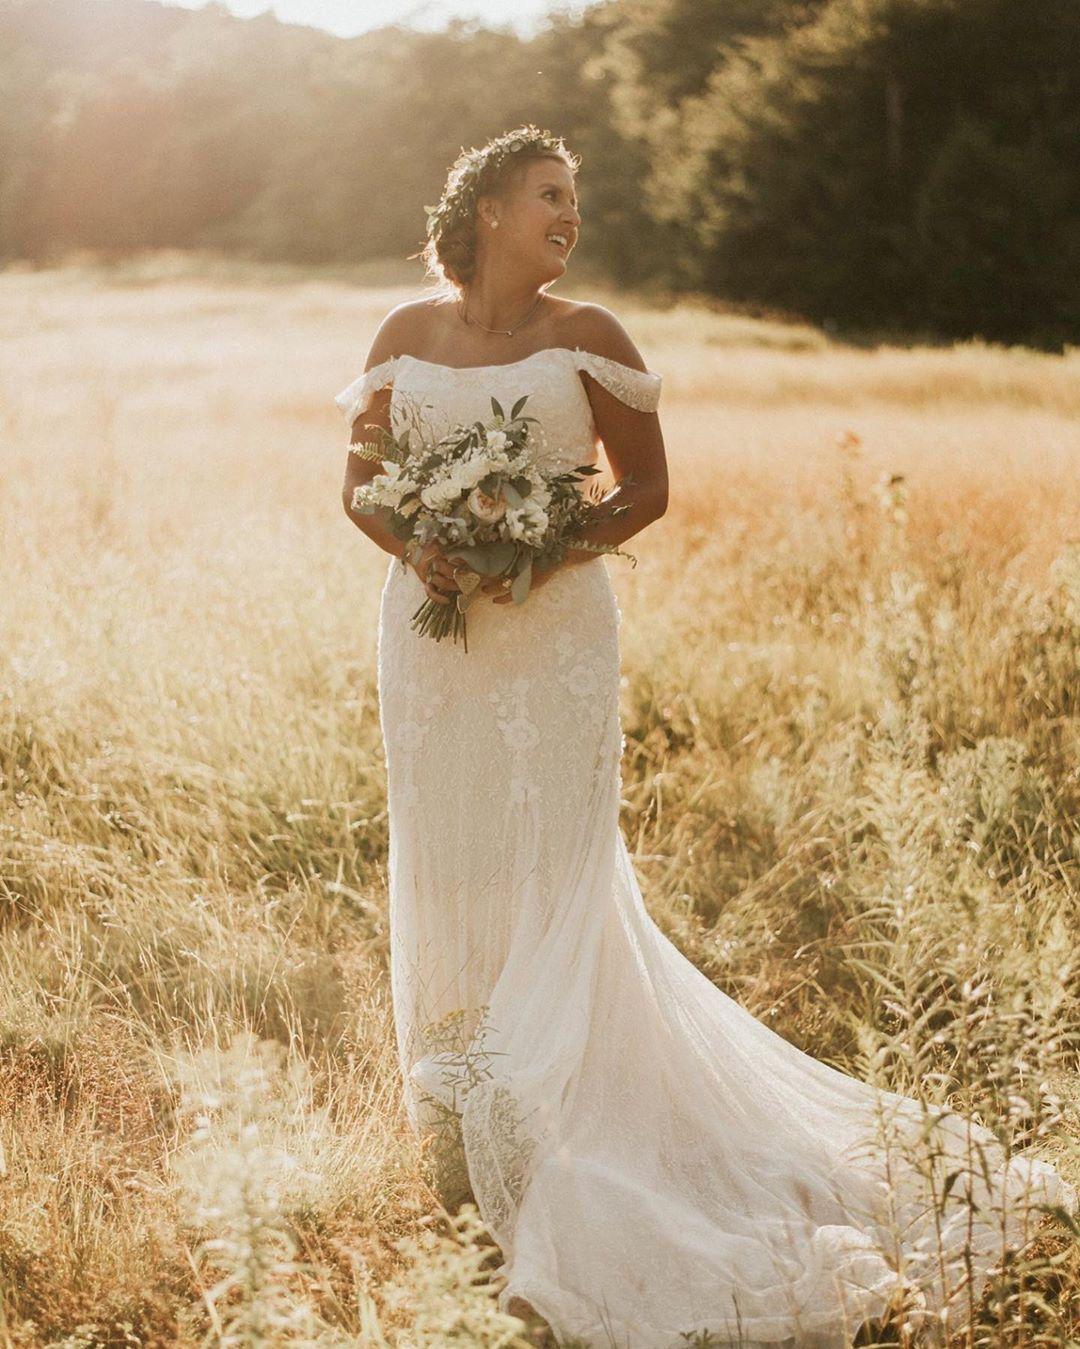 The Dreamiest Bohemian Wedding Photo From This Melissa Sweet Bride Davids Bridal Wedding Dresses Trumpet Wedding Dress Sweet Wedding Dresses [ 1349 x 1080 Pixel ]